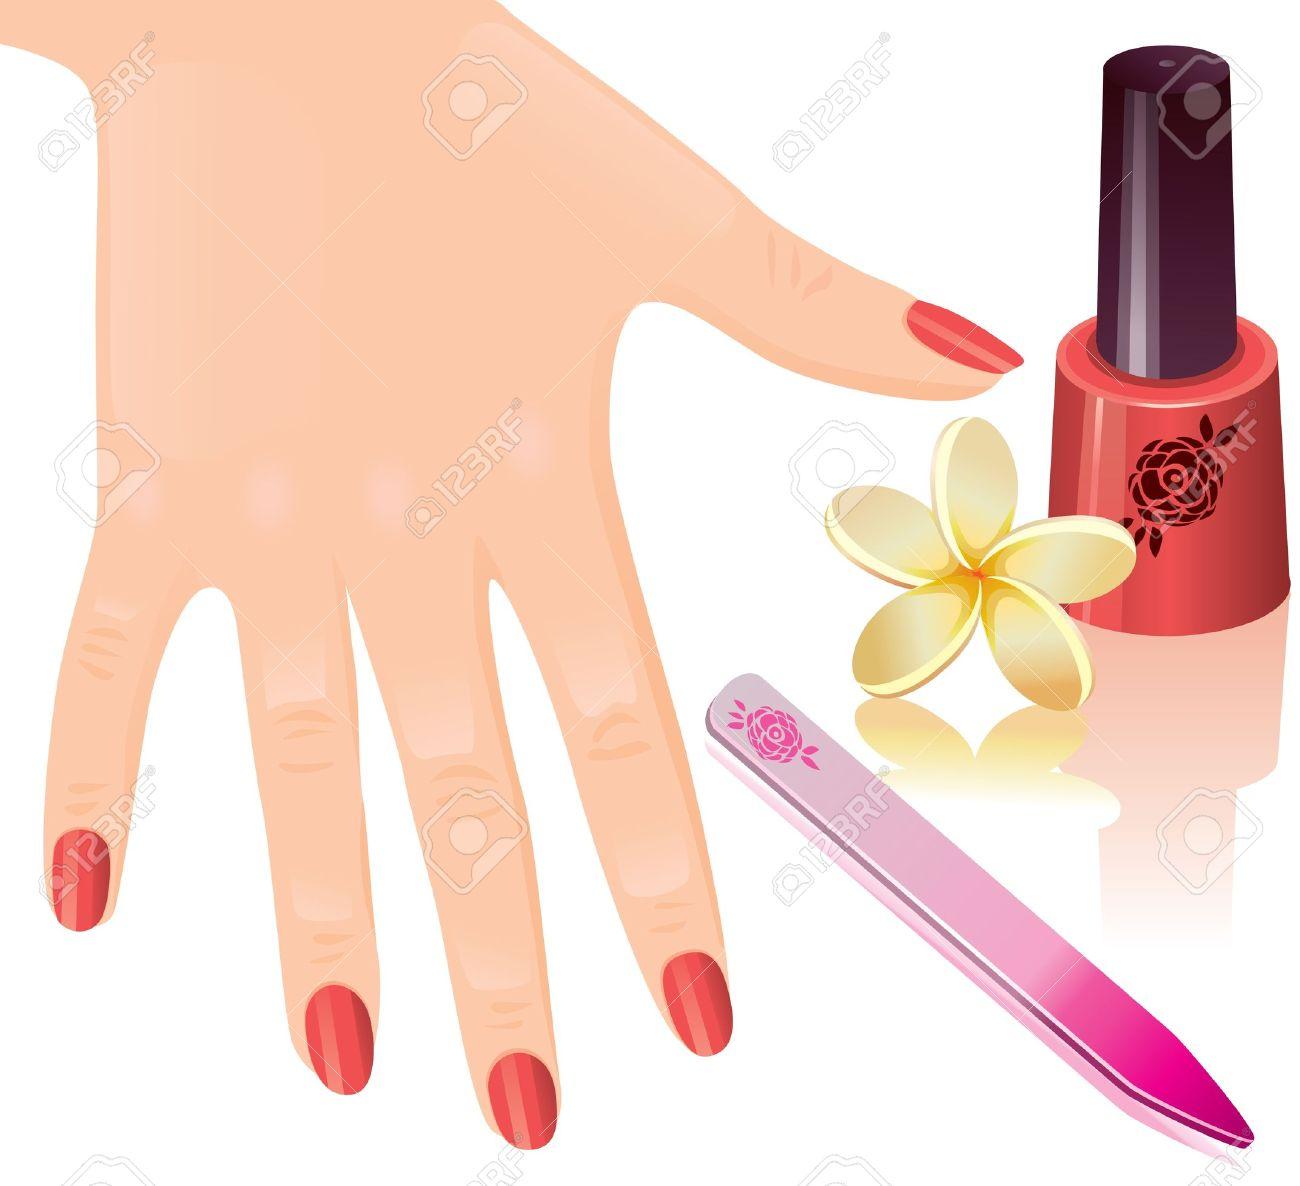 Nails clipart manicure 110 Clipart #1 Clipart Tiny